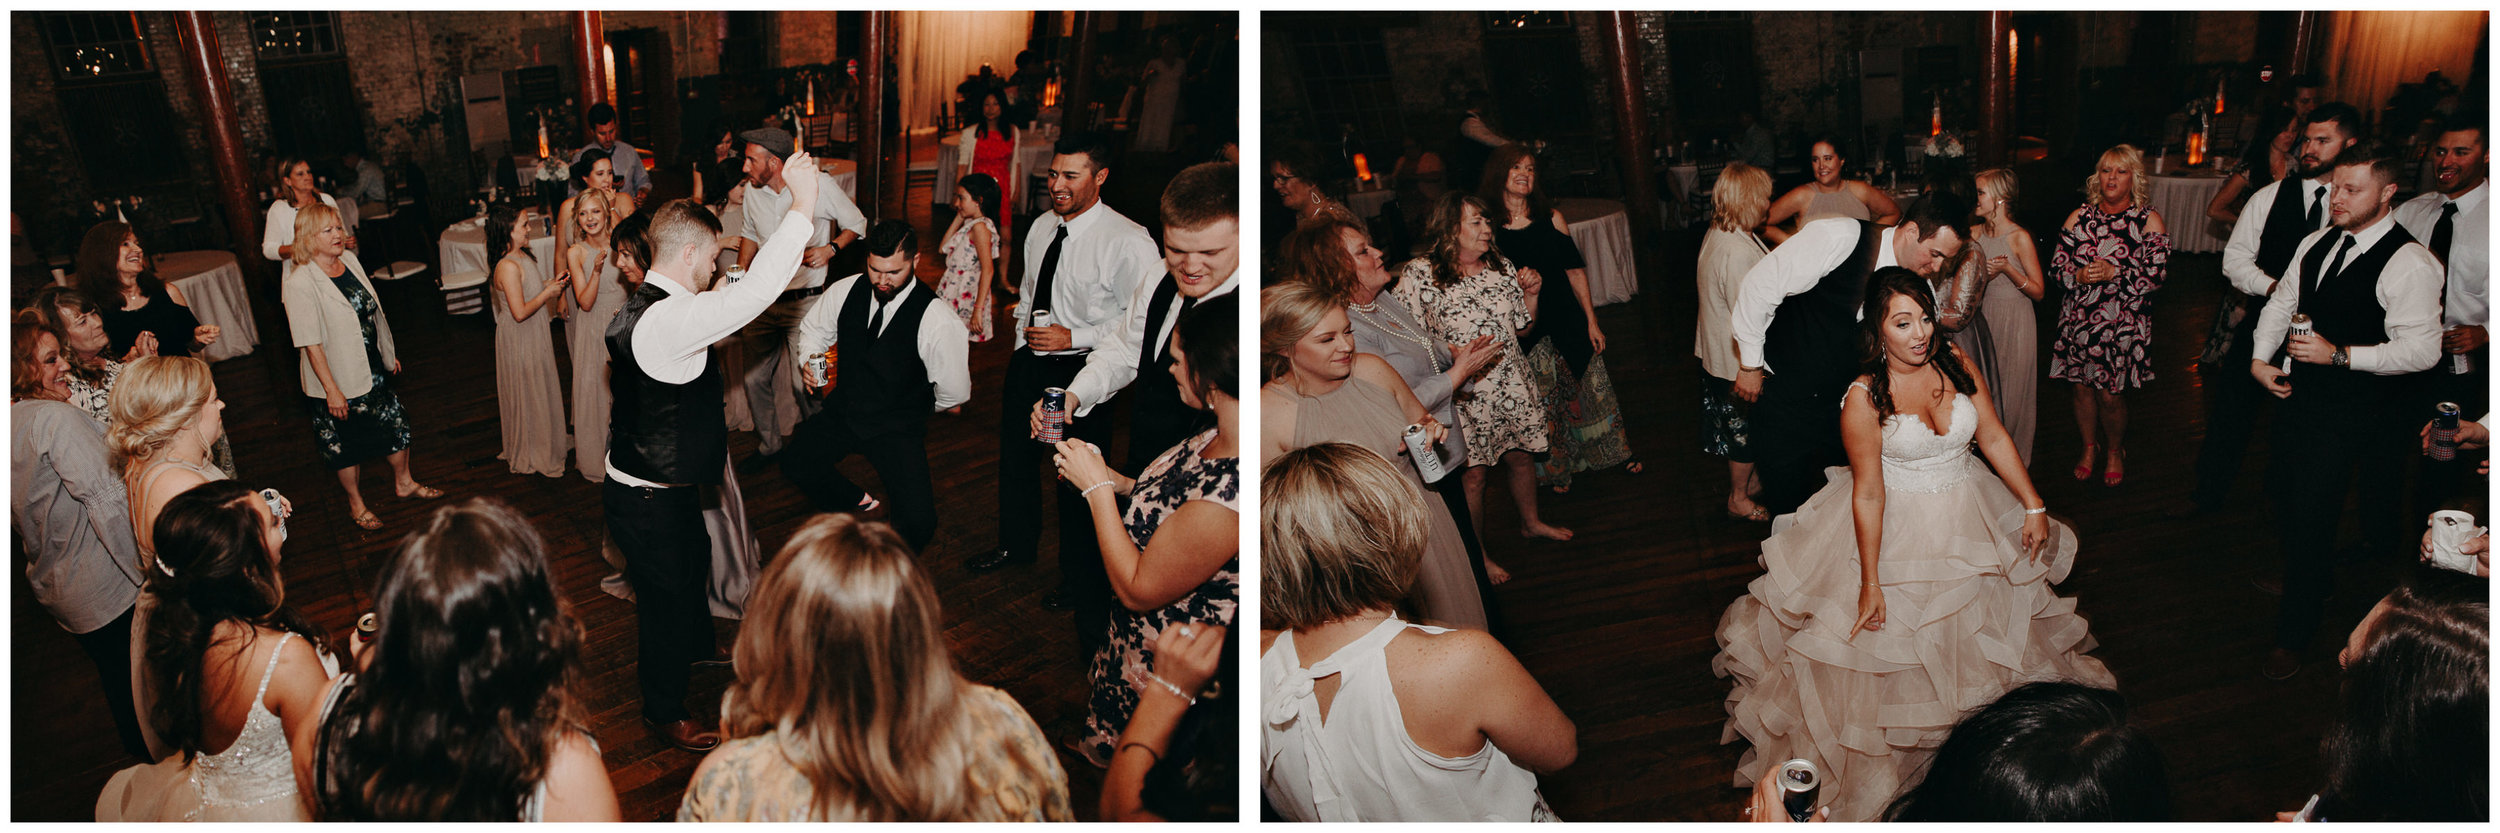 62 4 - Atlanta Wedding Photographer - The engine room - Ga - Wedding trends - Aline Marin Photography.jpg